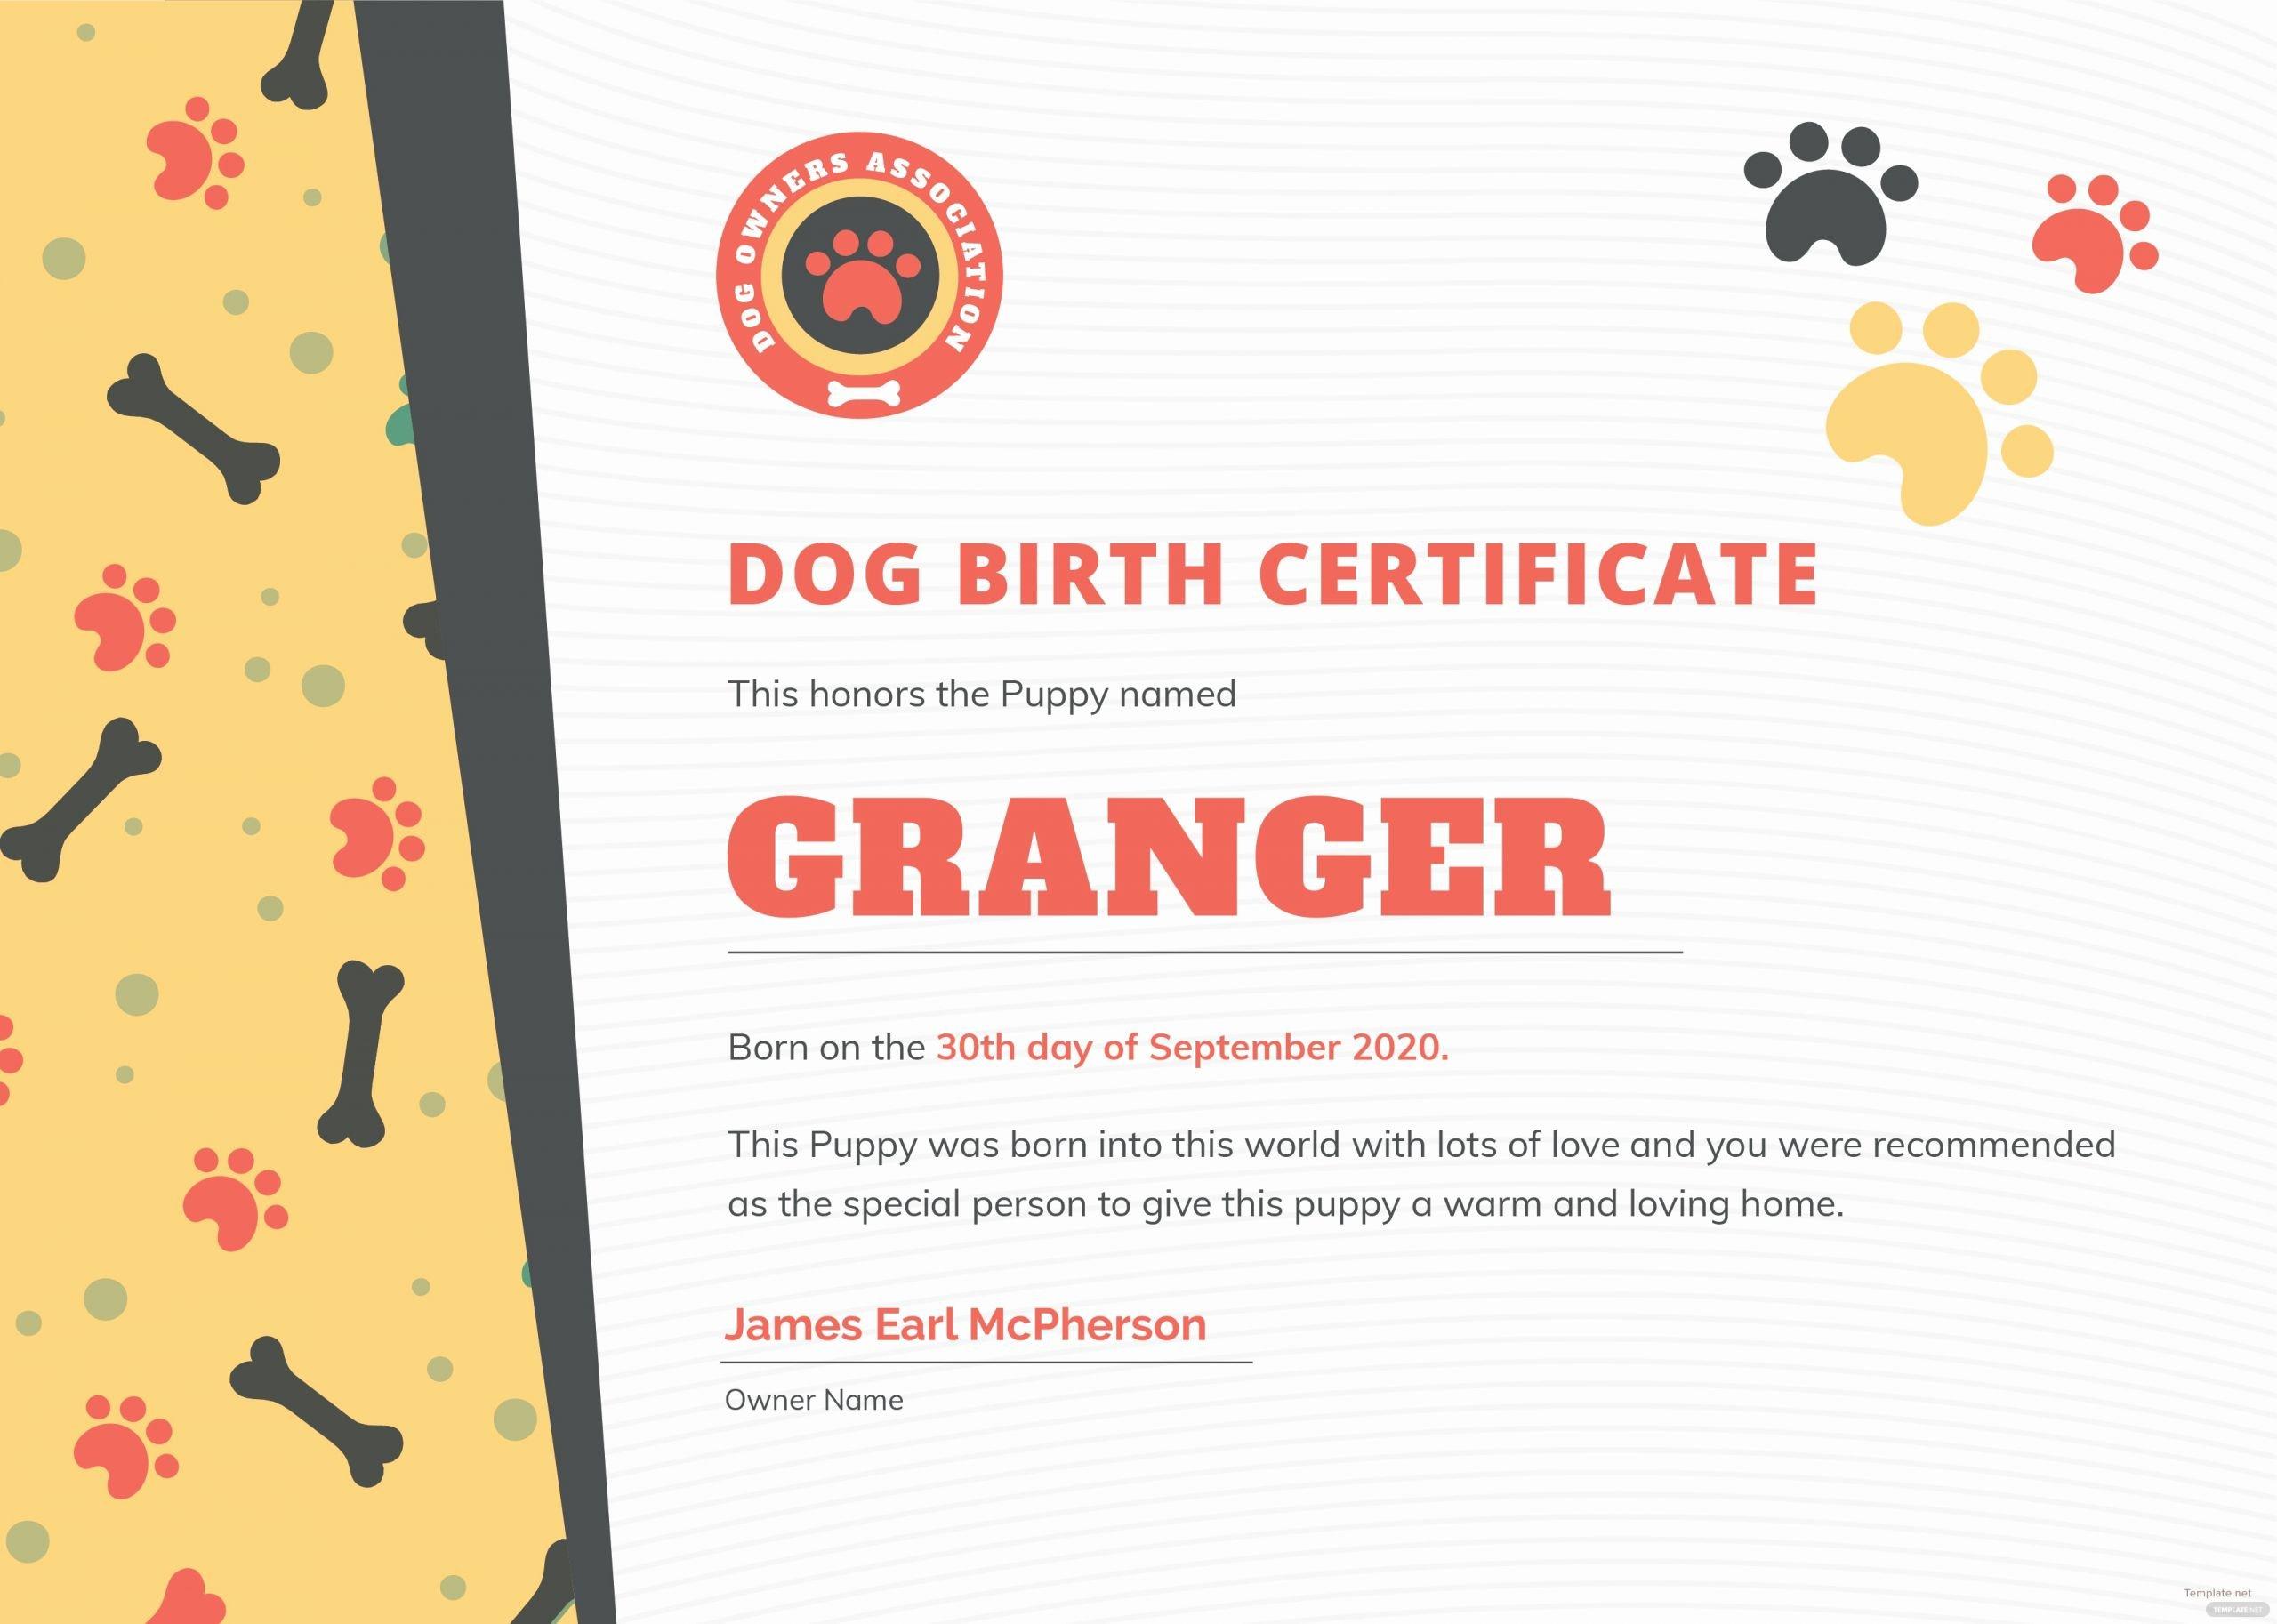 Dog Birth Certificate Template Unique Free Dog Birth Certificate Template In Adobe Shop